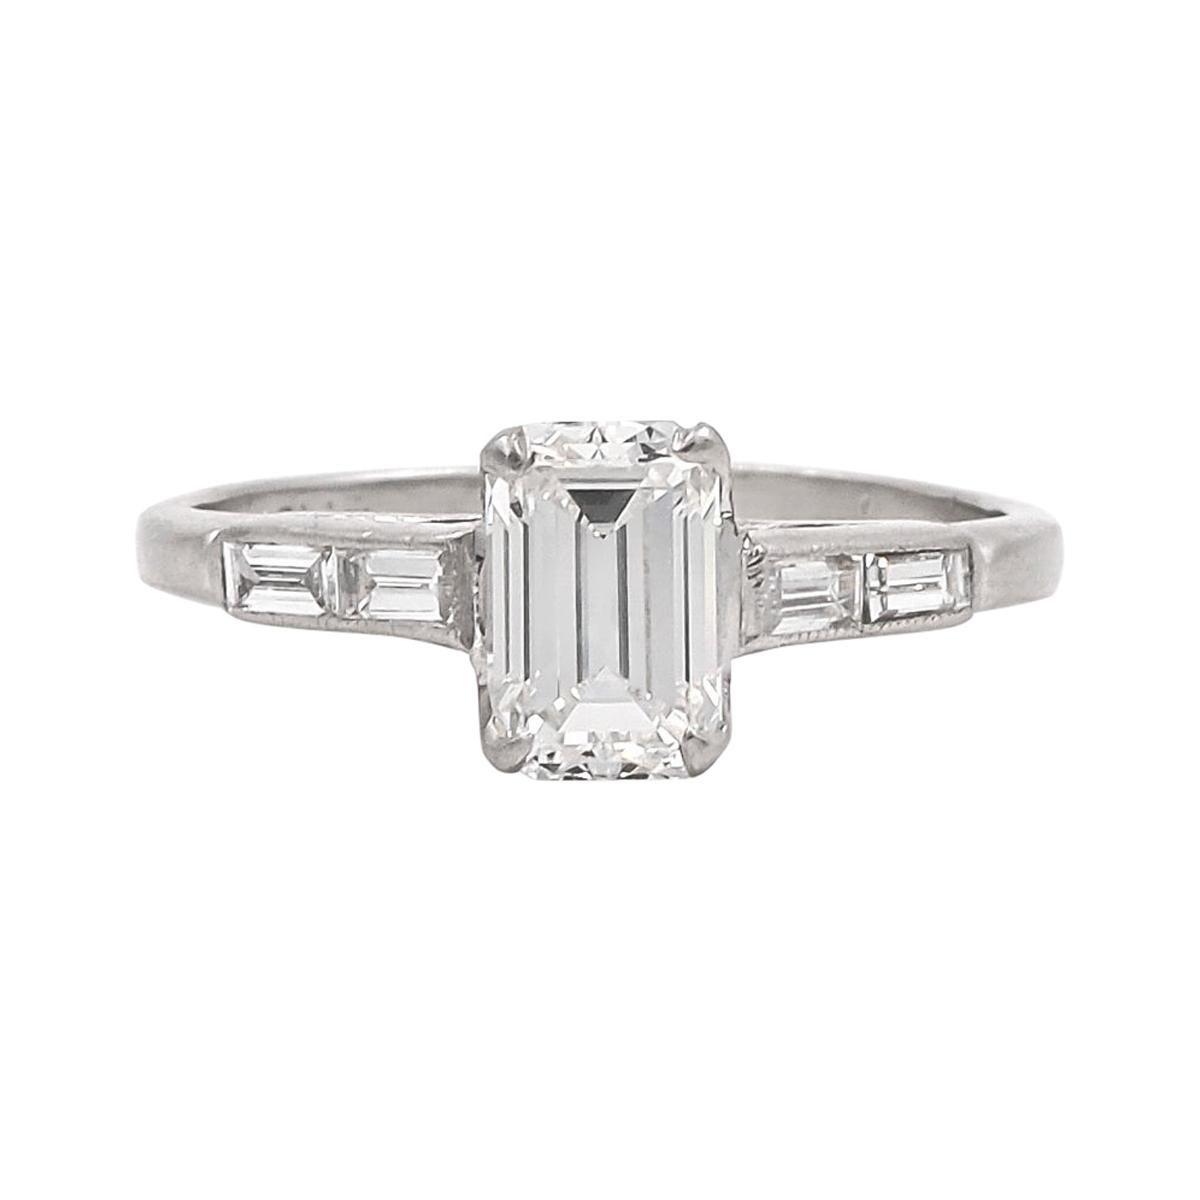 Art Deco 1.05 Carat GIA Certified G/VS1 Emerald Cut Diamond Engagement Ring